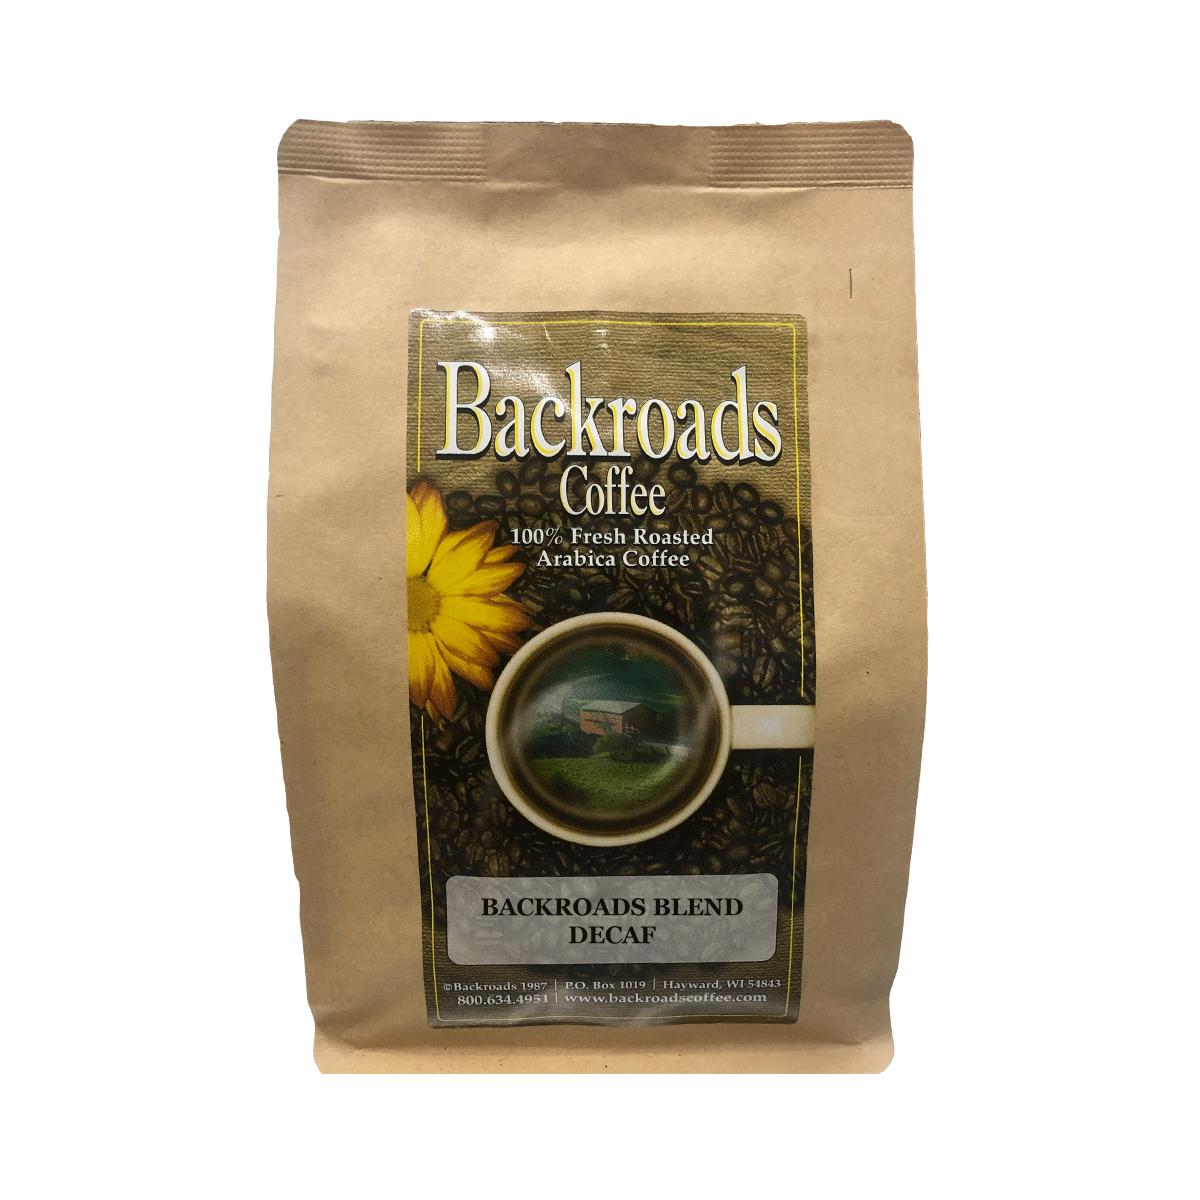 Backroads Blend Decaf 8 oz Coffee